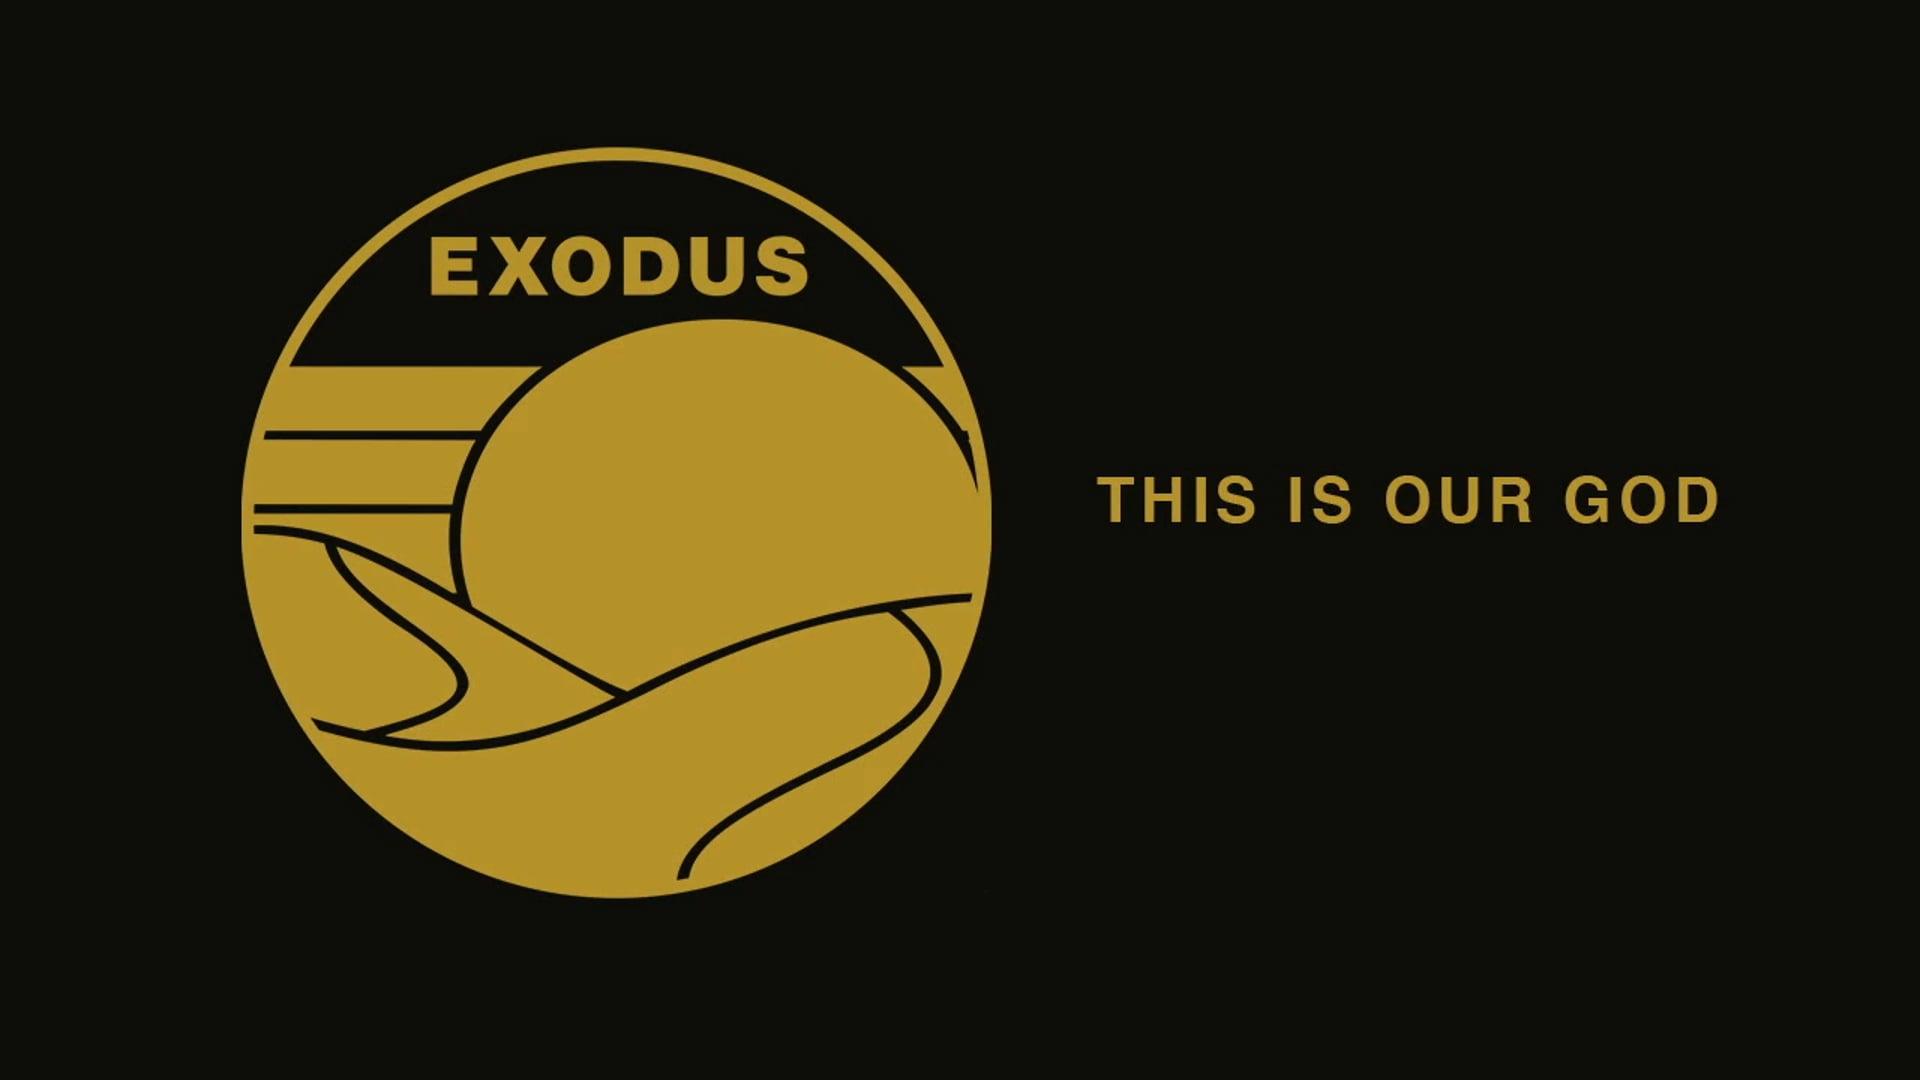 Week 7: A Disturbing Night Exodus 11:1-13:16